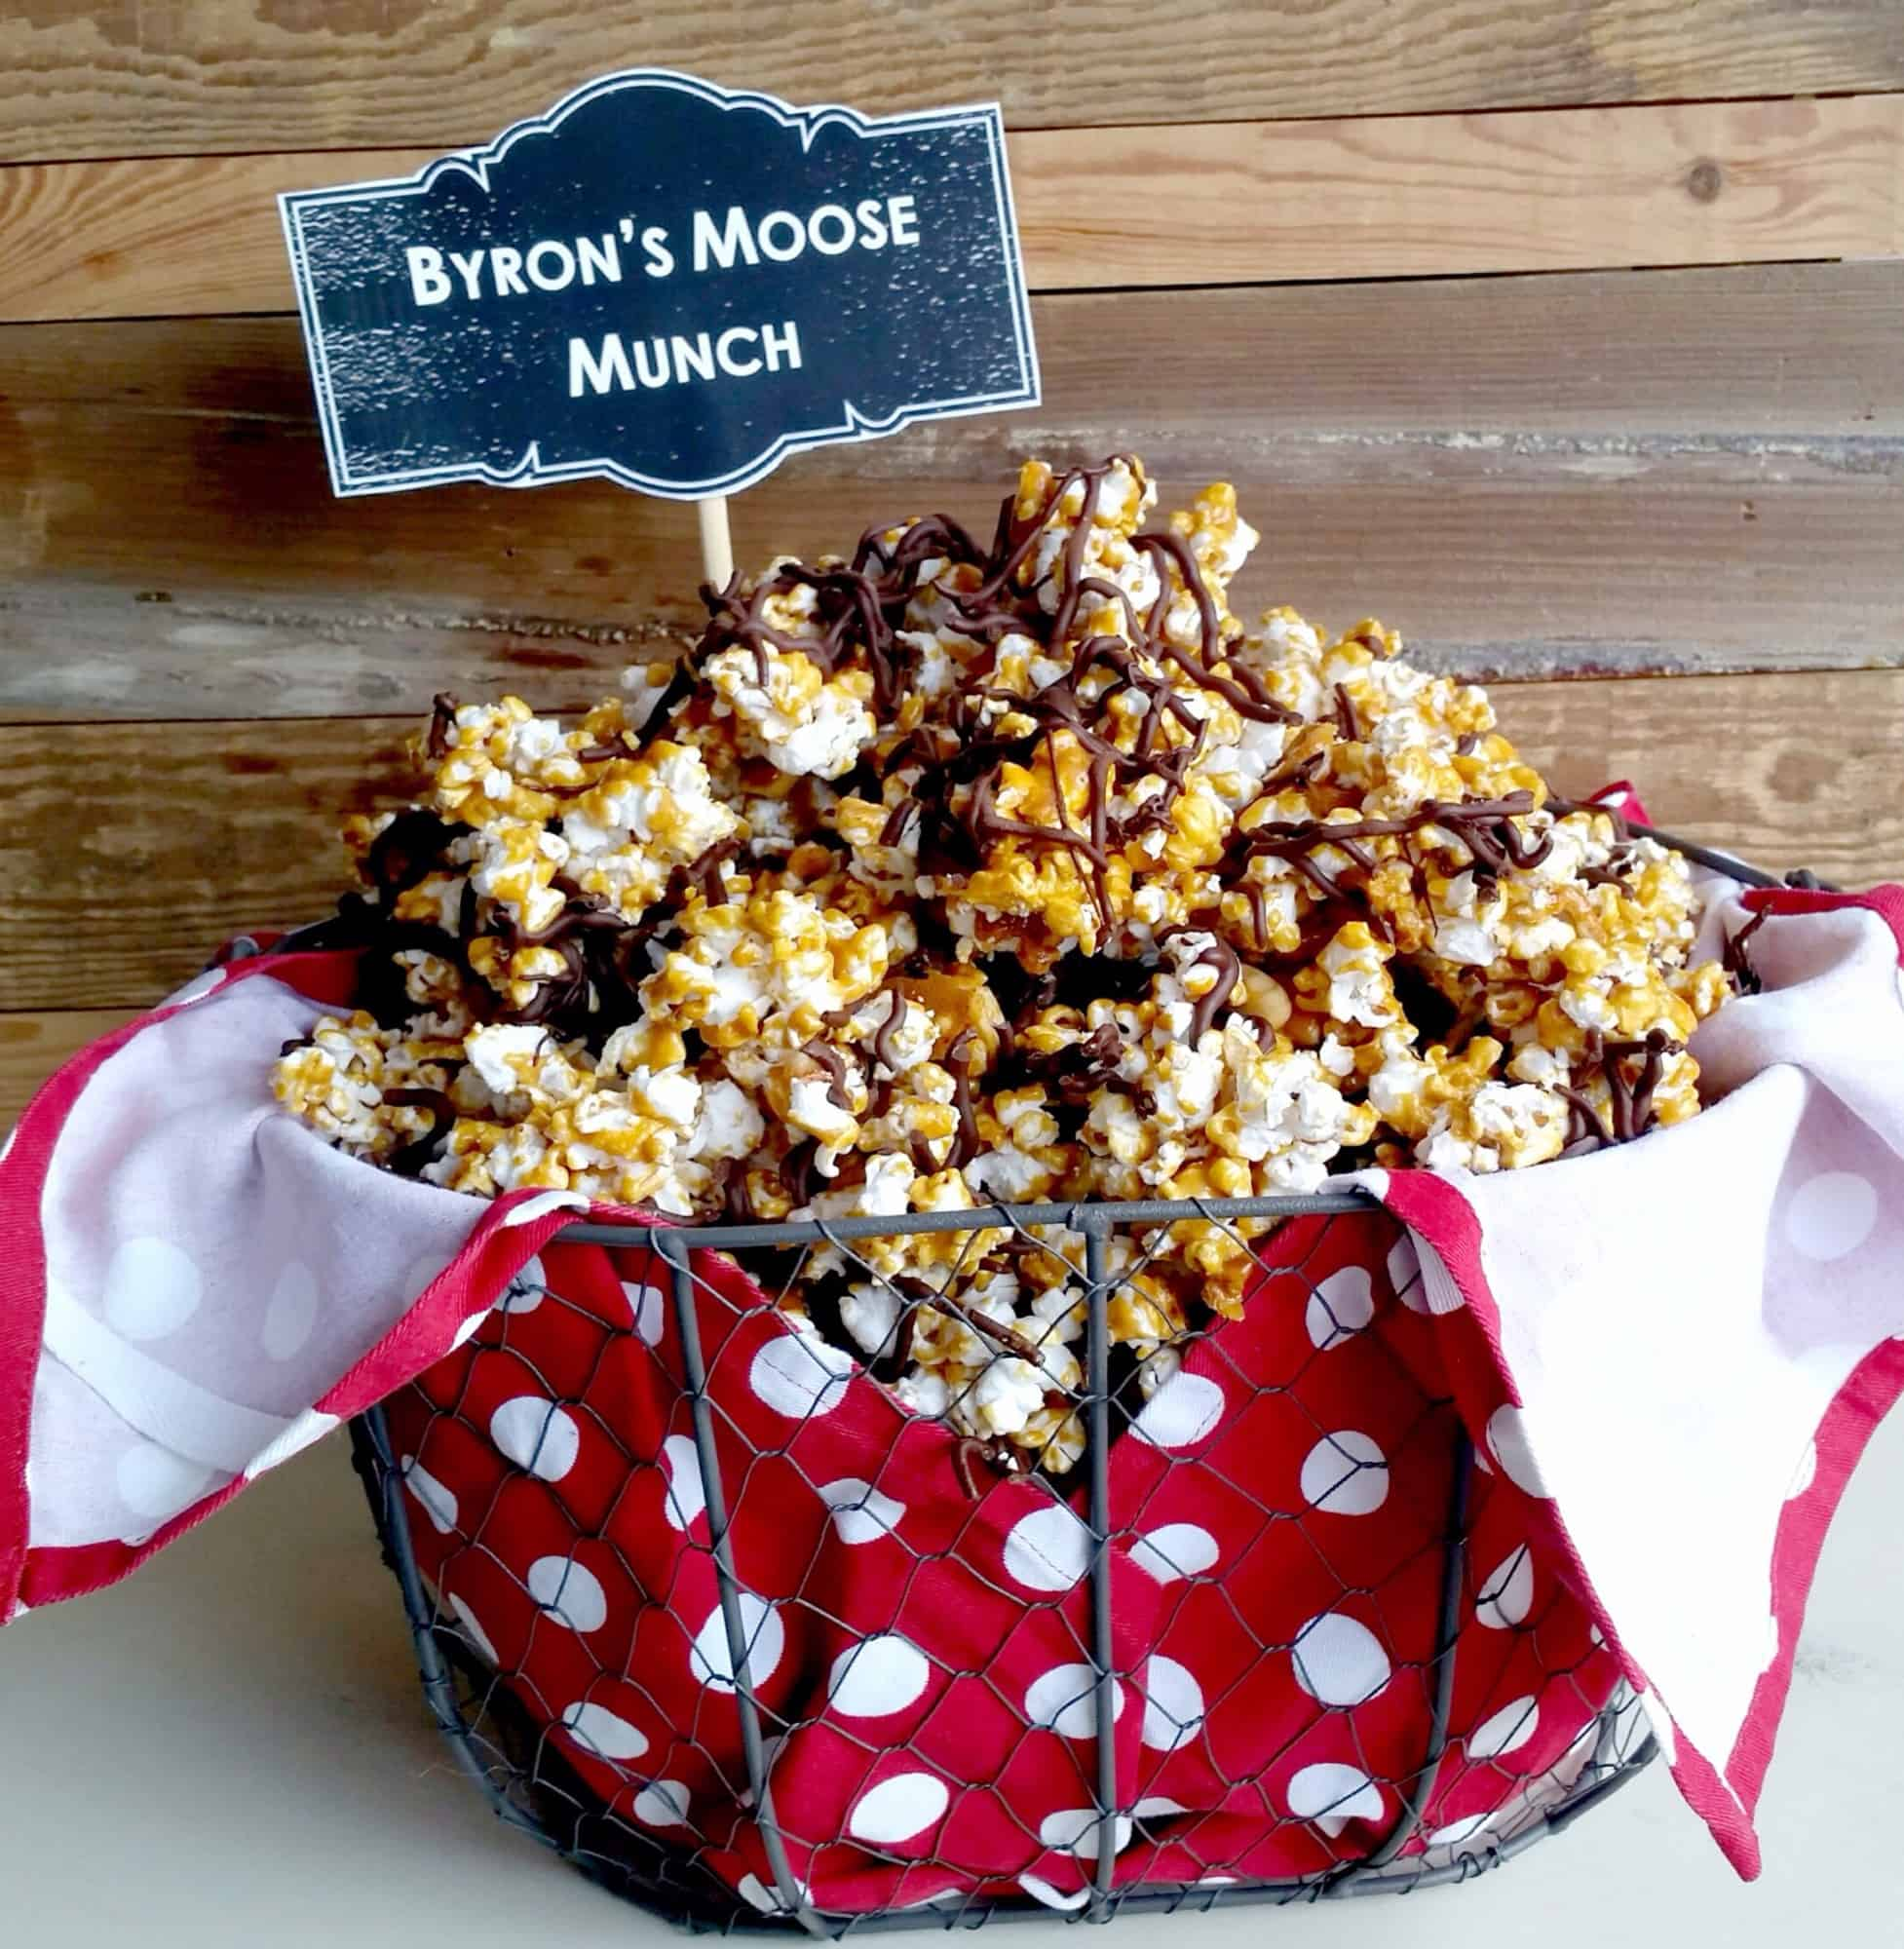 Byron's Moose Munch & Candy Bar